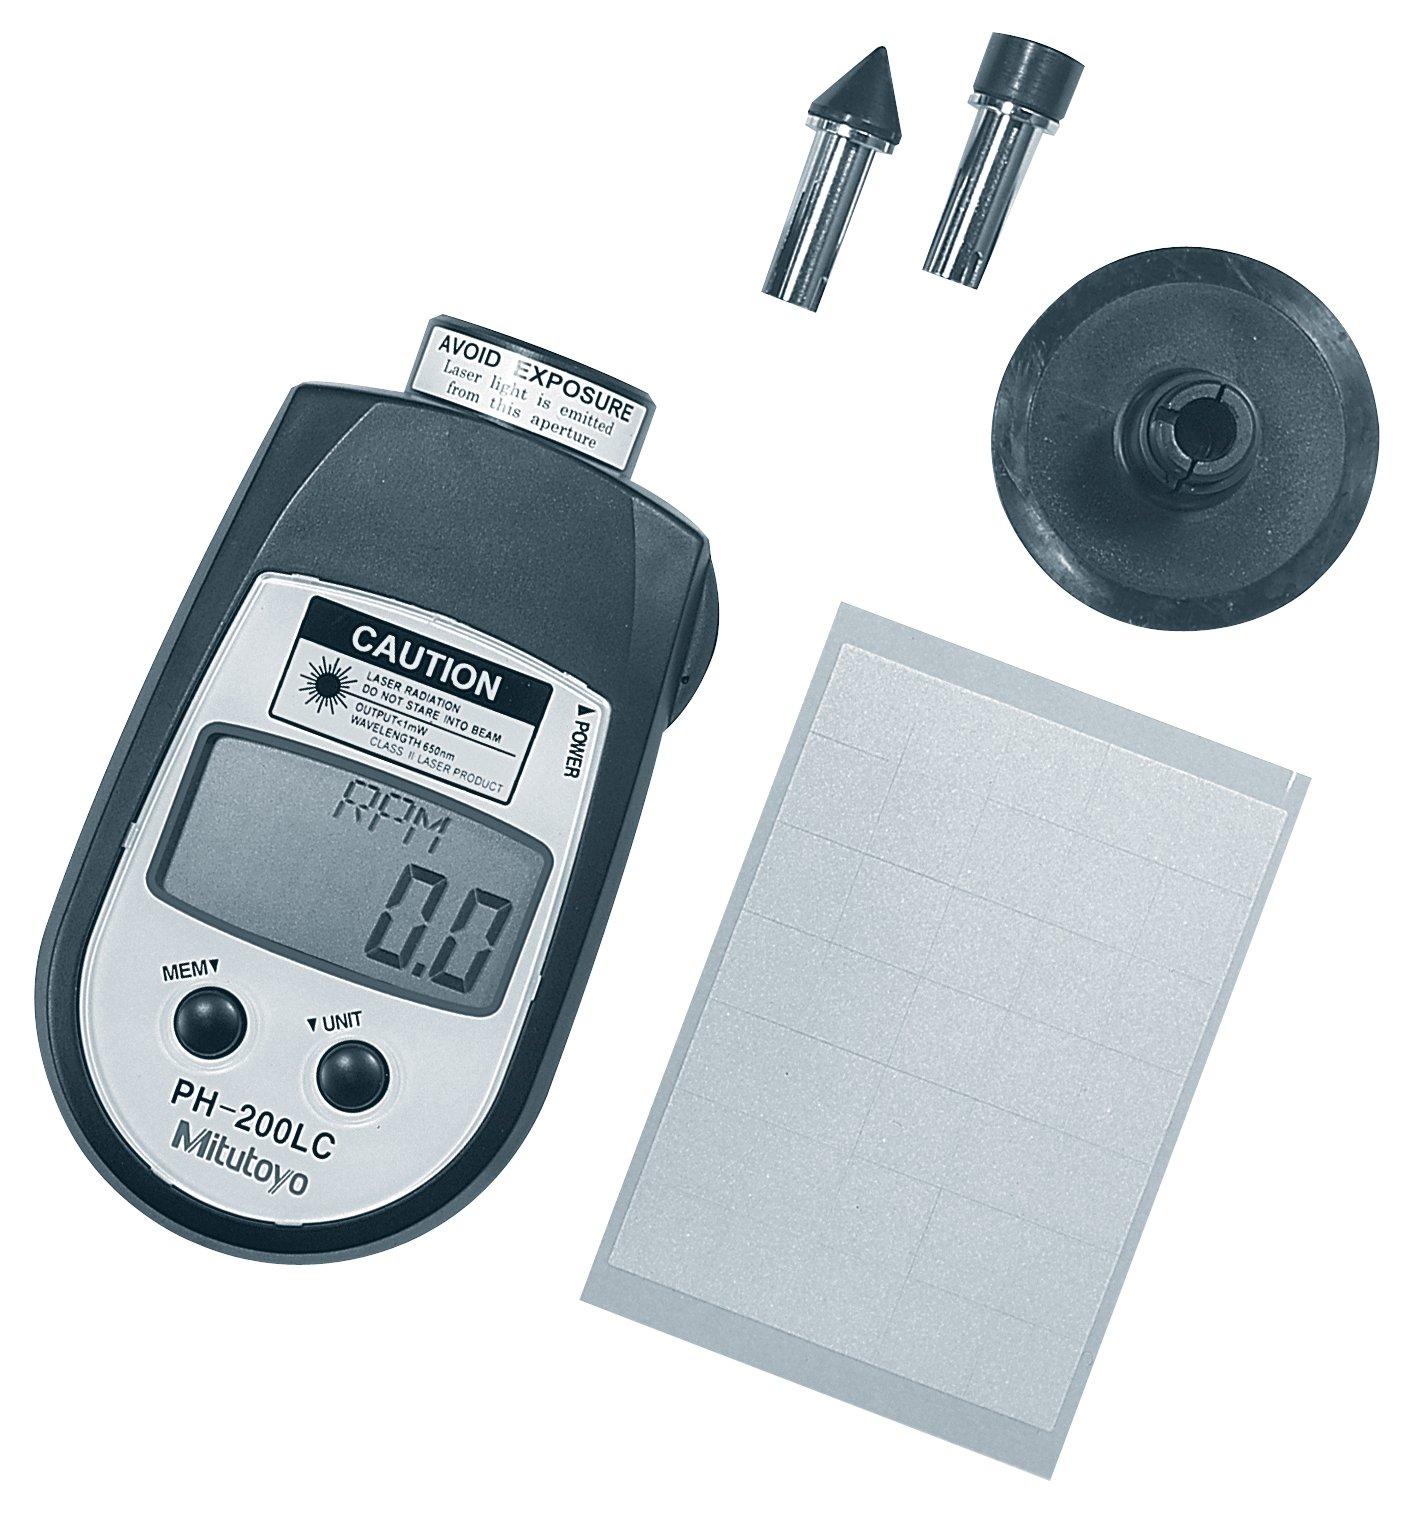 Mitutoyo 982-552, Digital Hand Tachometer, Contact 6 to 25,000 rpm / Non-Contact 6 to 99,999 rpm, Contact/Non-Contact Style